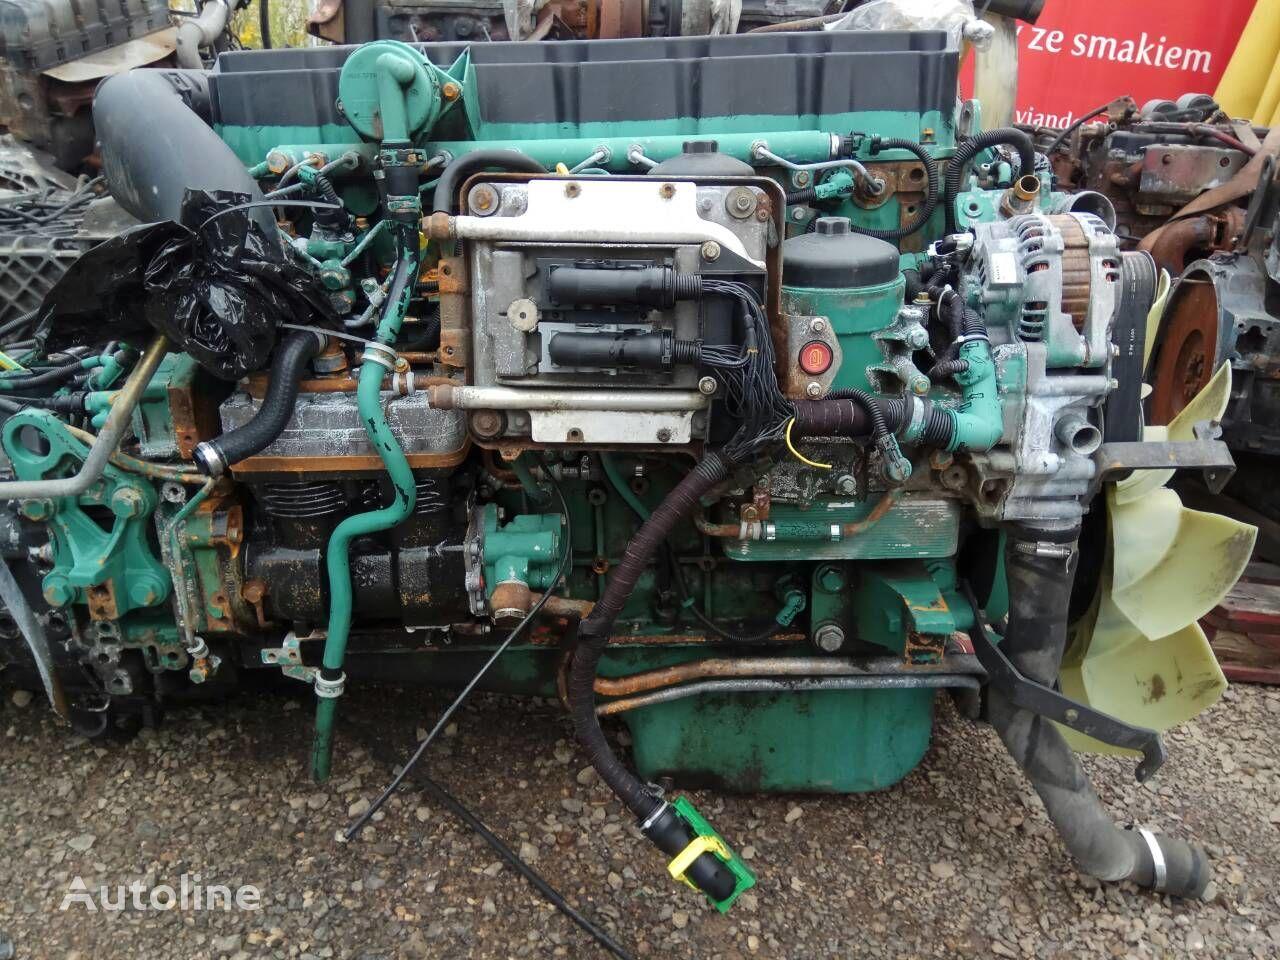 двигатель VOLVO D7E 240 E4 для грузовика VOLVO FL FE